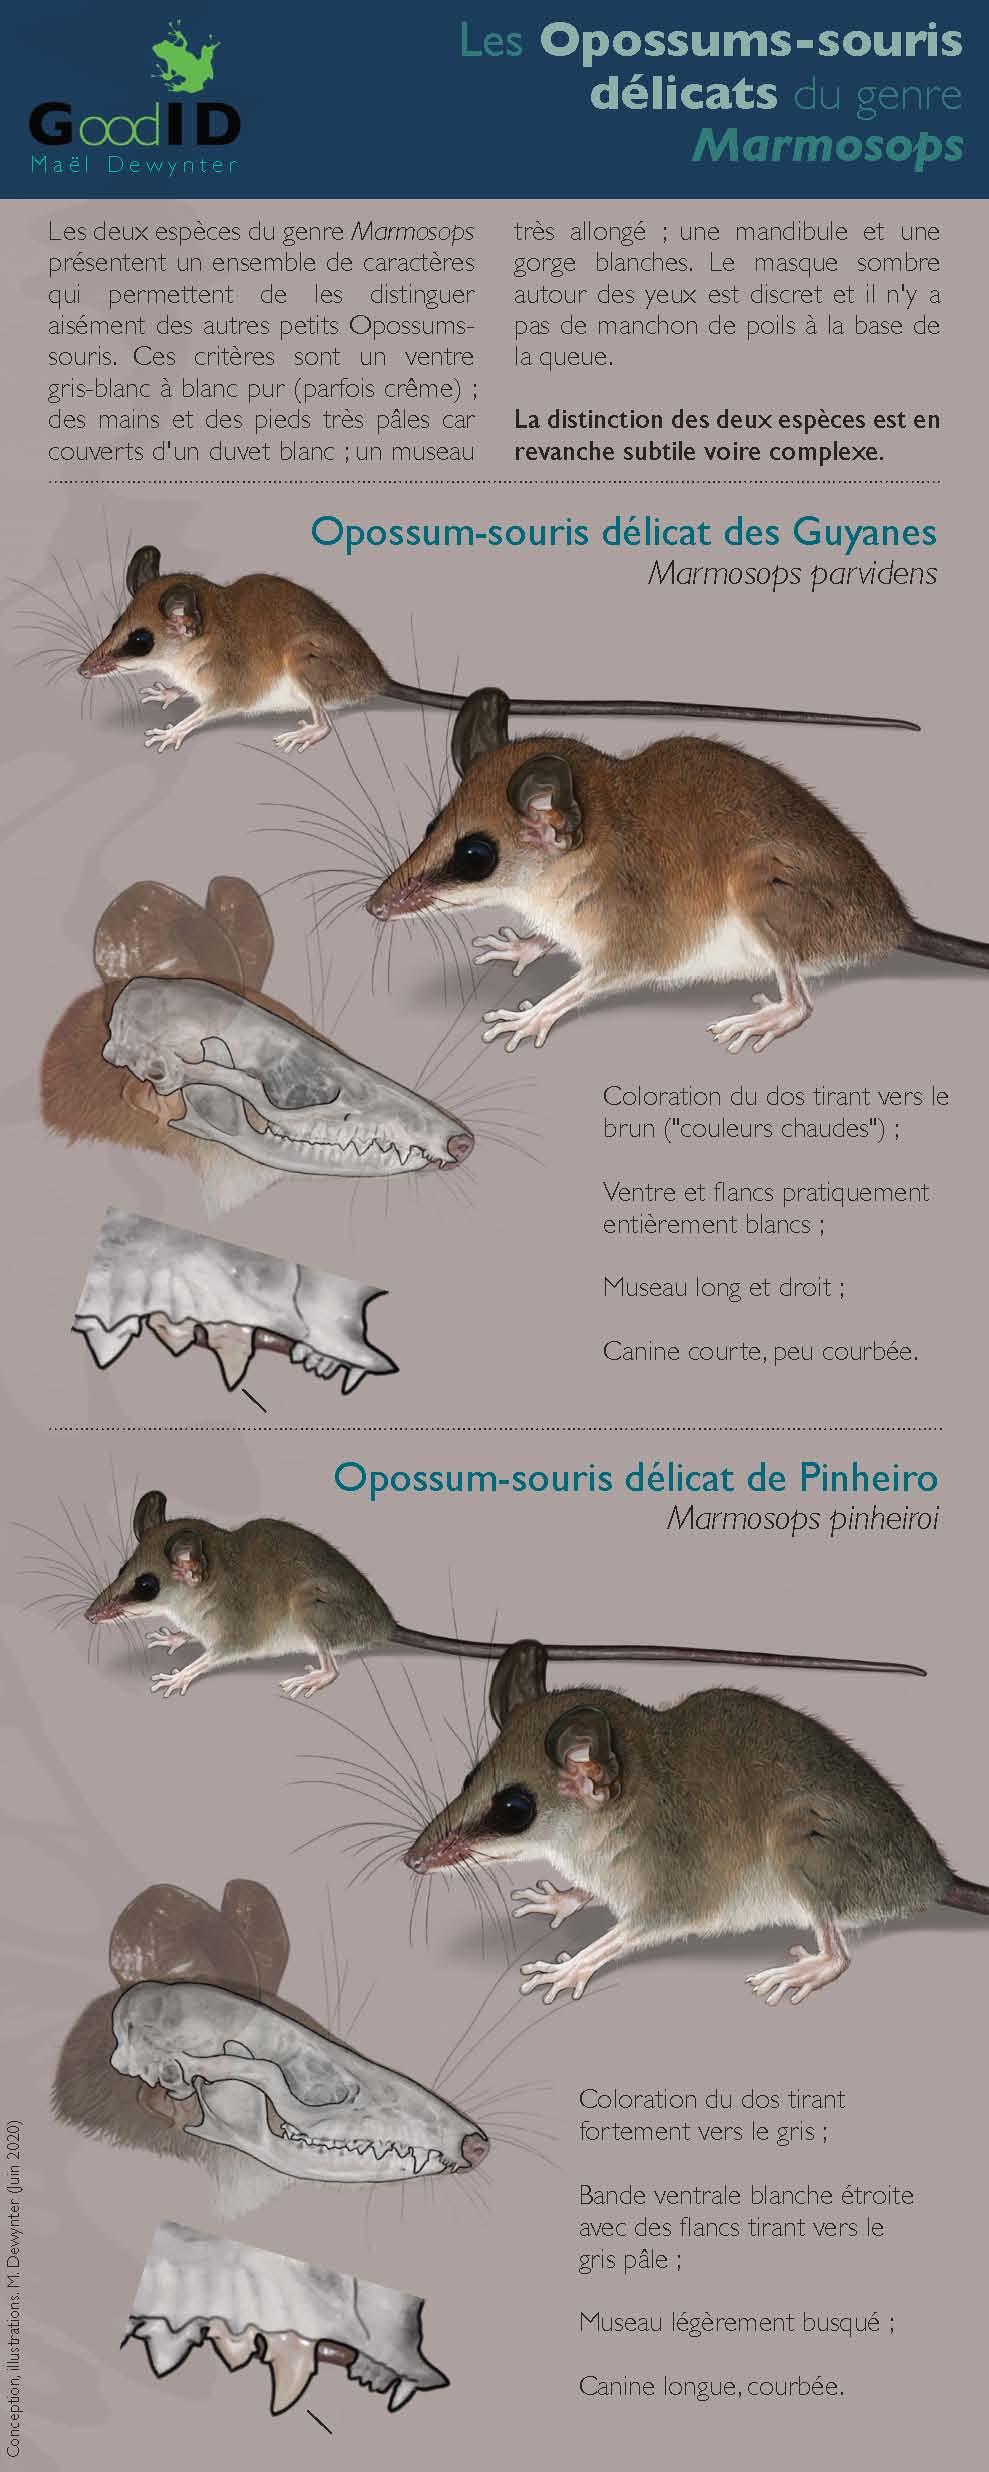 https://cdnfiles1.biolovision.net/www.faune-guyane.fr/userfiles/Documentsdivers/Mammifres/IdentificationdesMarmosopsv2020.jpg